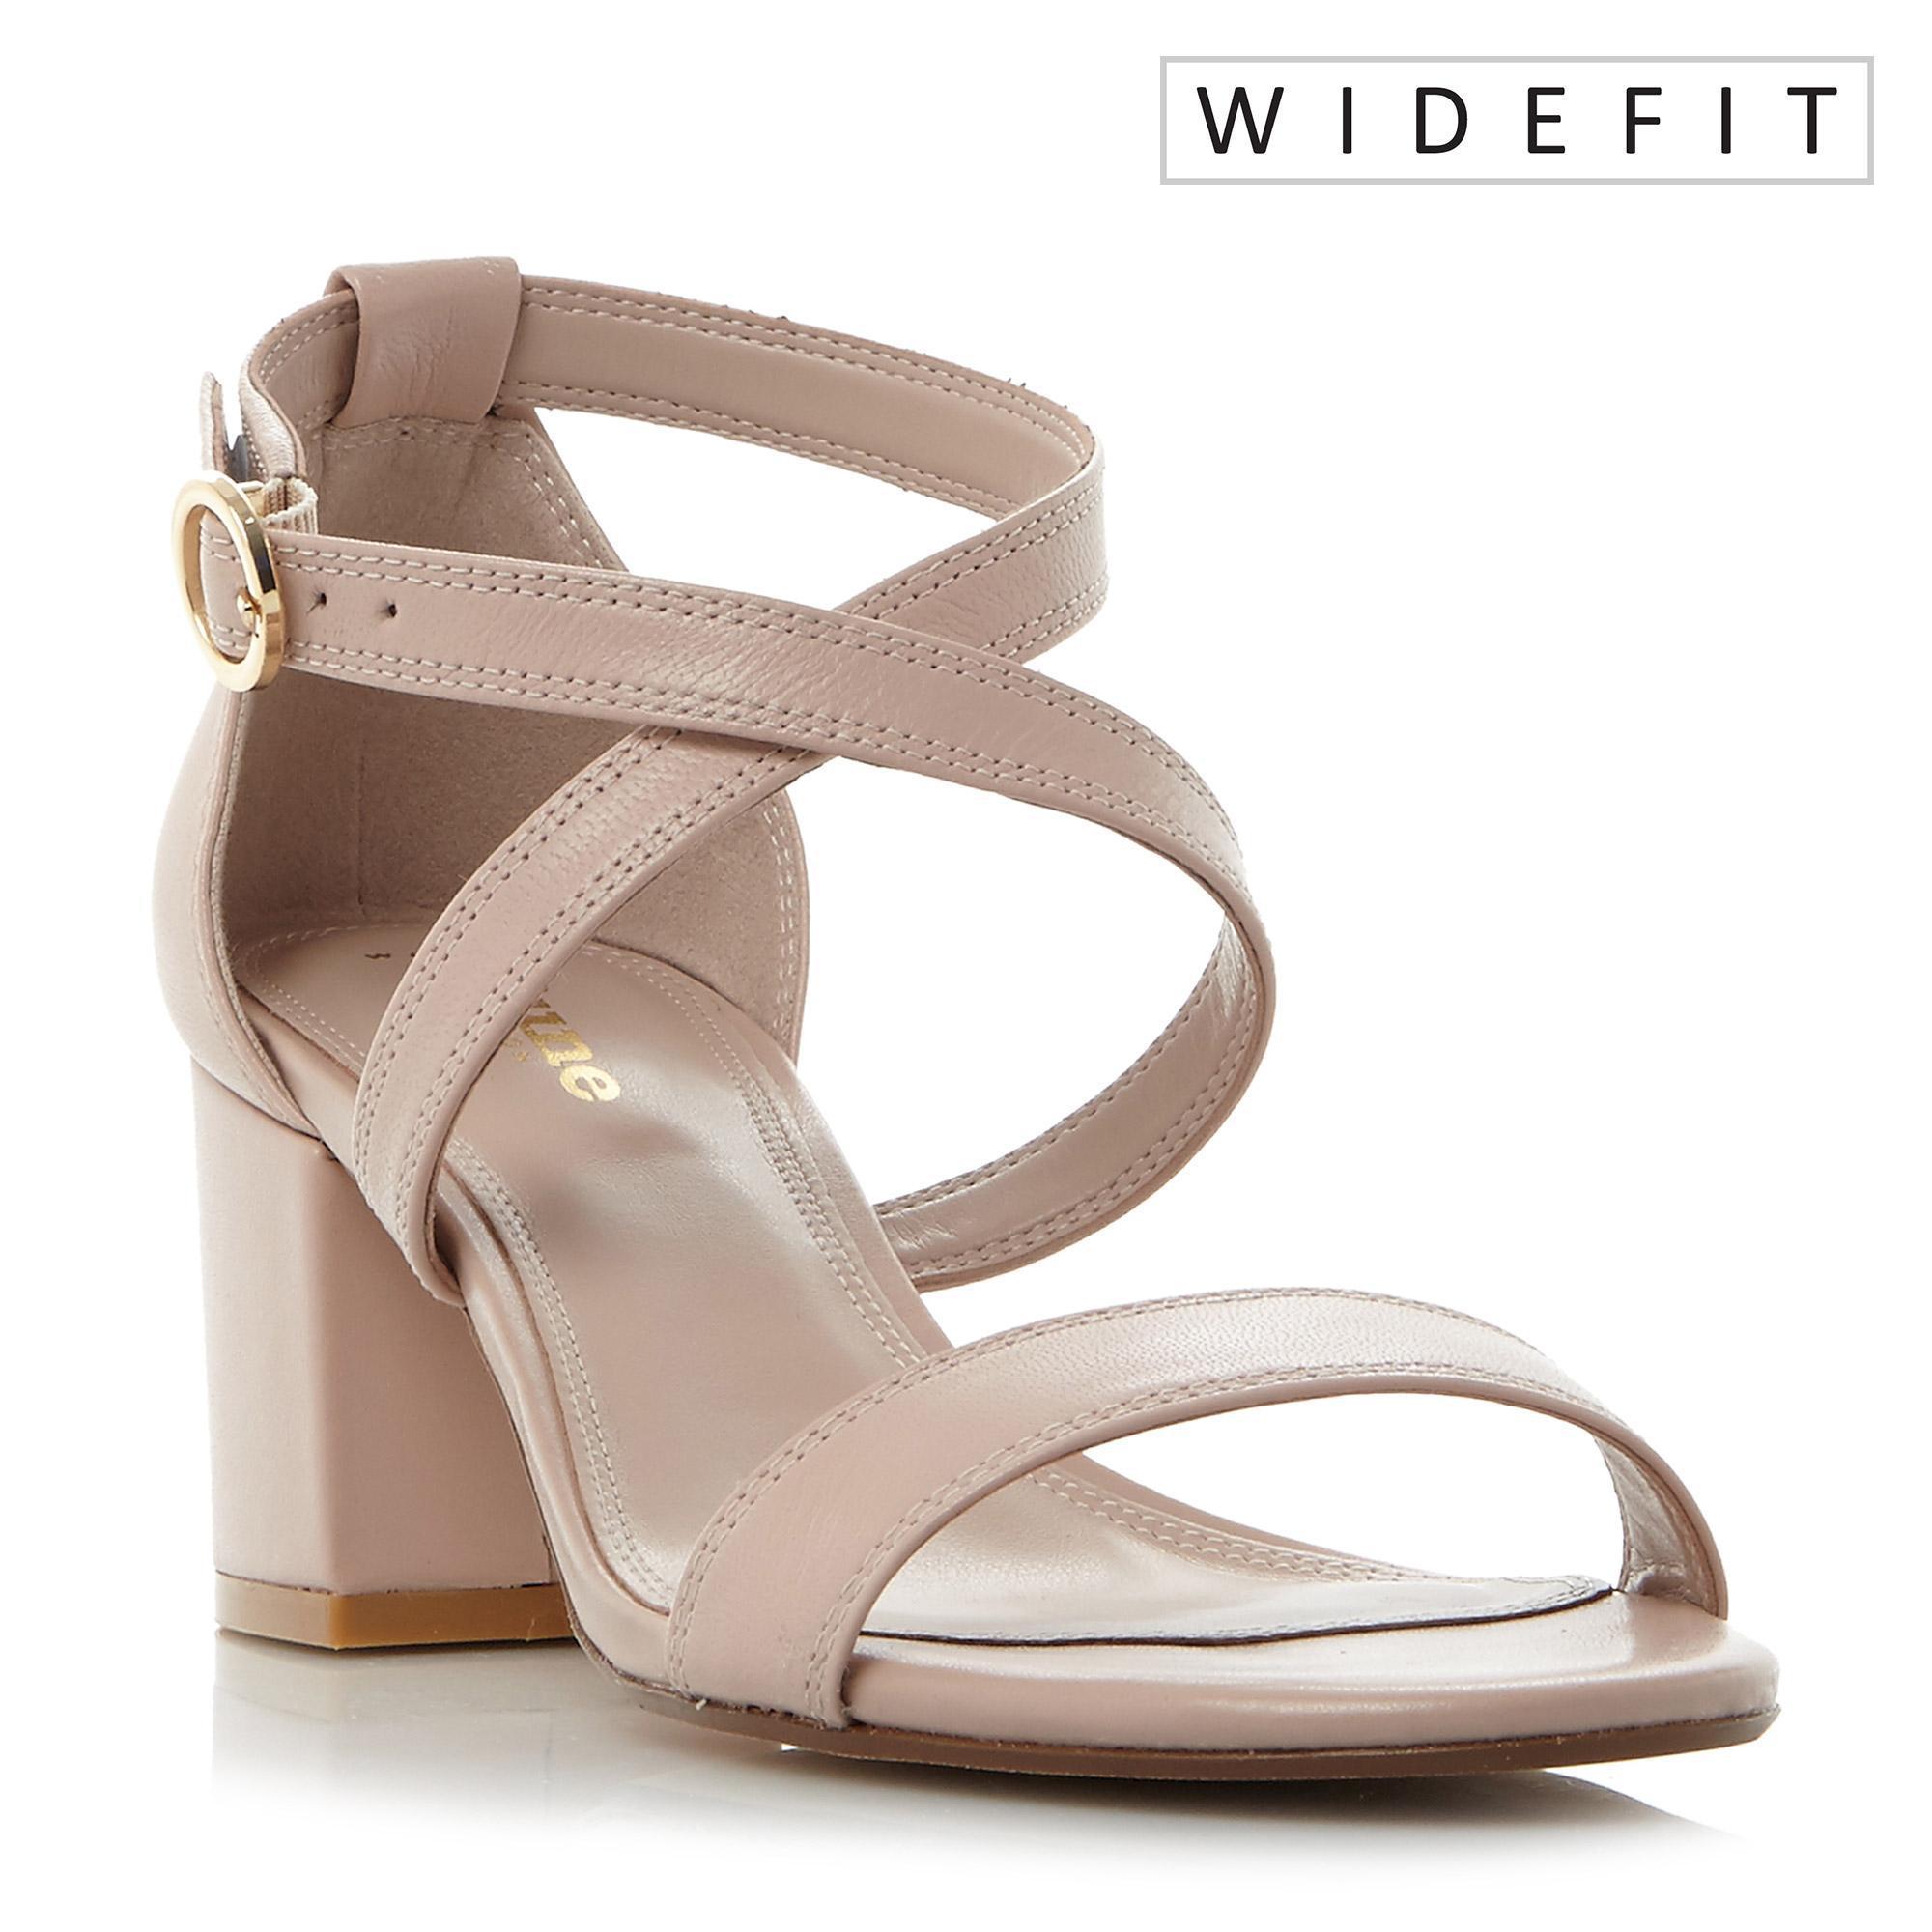 67173186b1a0 Dune. Women s Cross Strap Block Heel Sandal